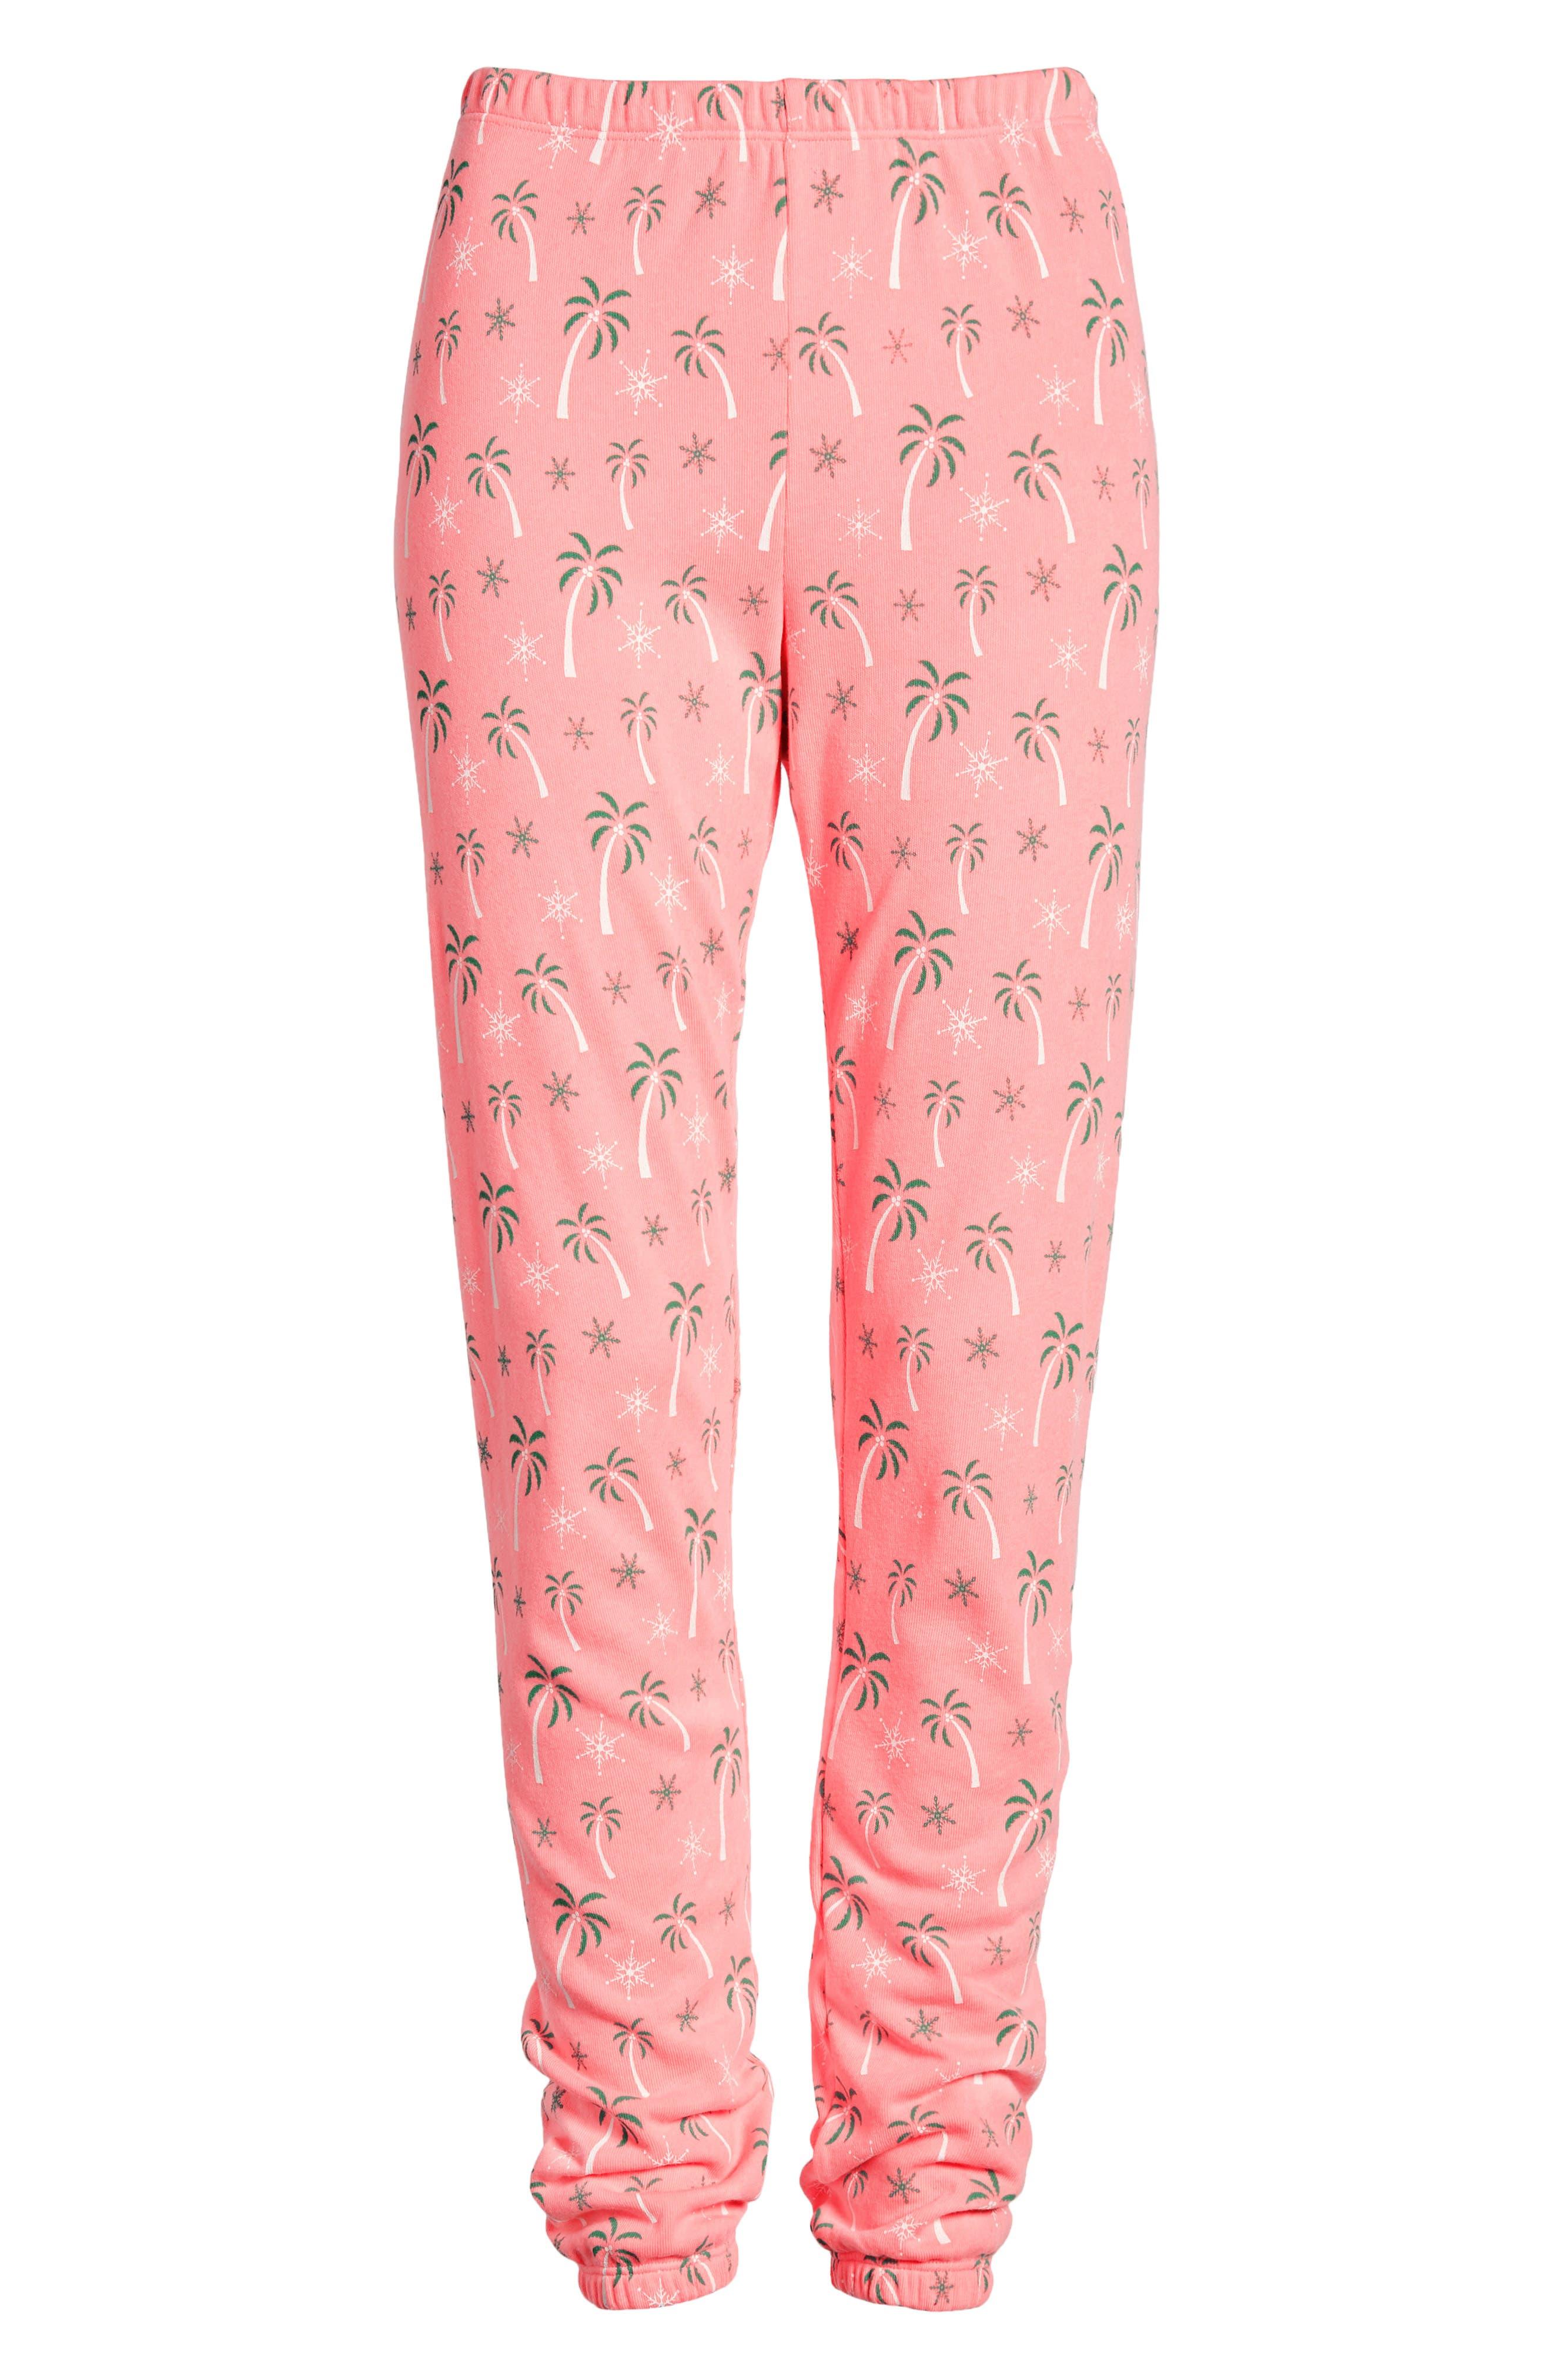 Tropical Christmas Sweatpants,                             Alternate thumbnail 6, color,                             NEON SIGN